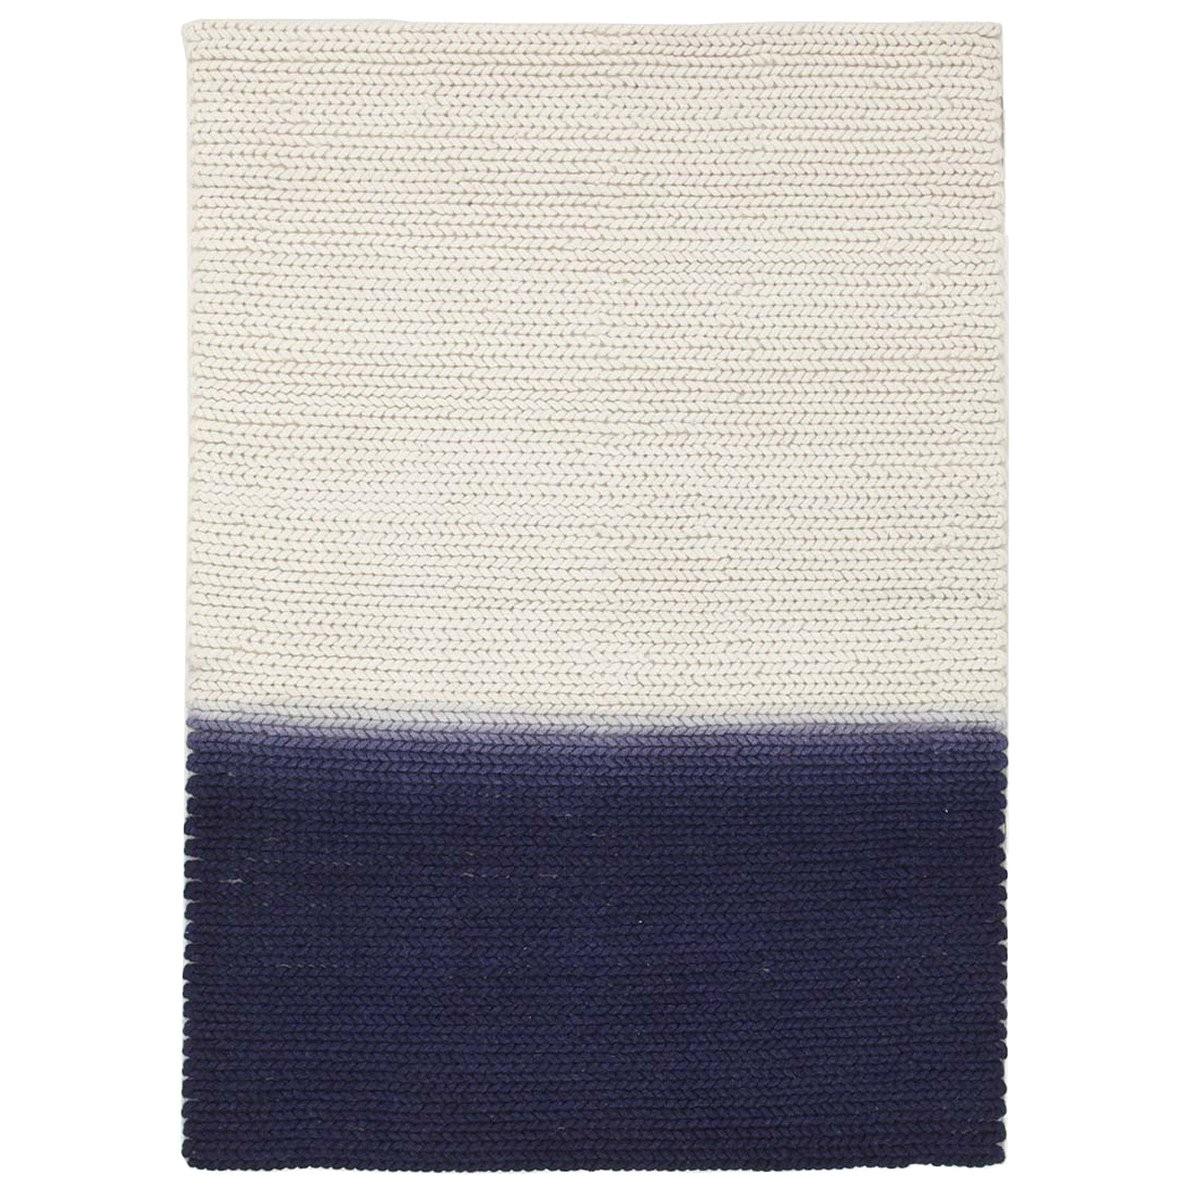 Fantasy Neele Handmade Wool Rug, 155x225cm, Blue